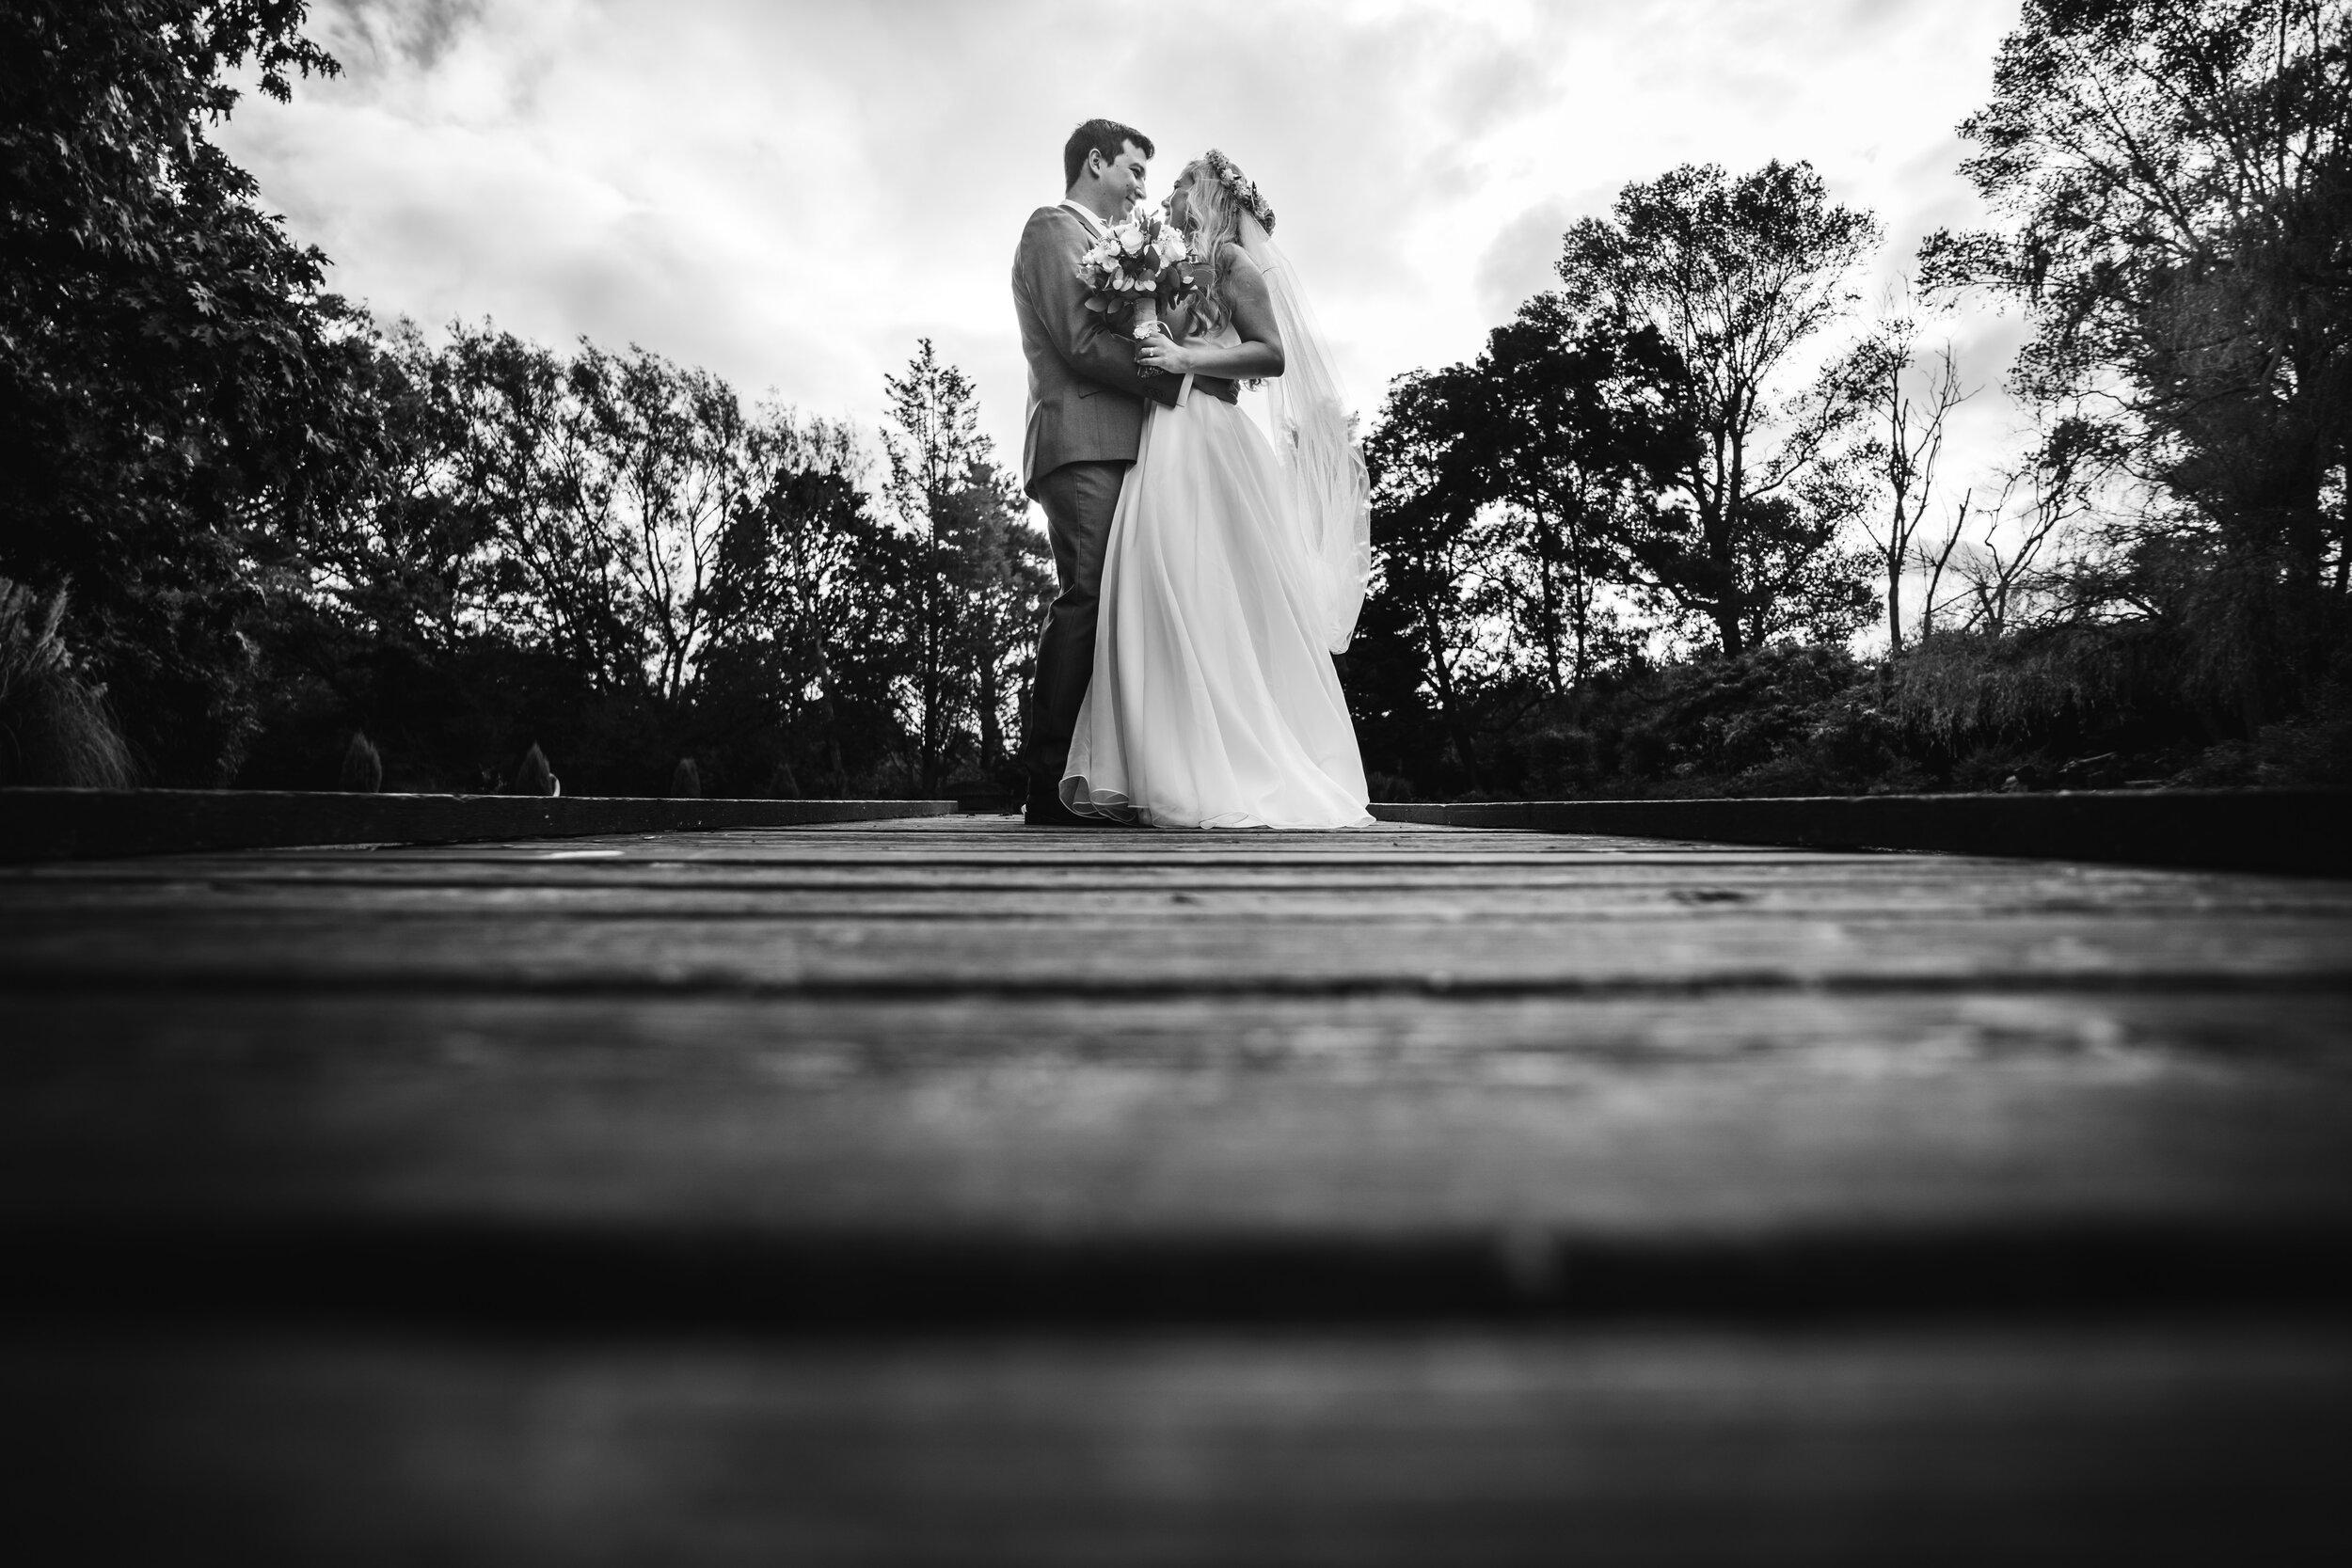 kent-wedding-photographer-100925.jpg